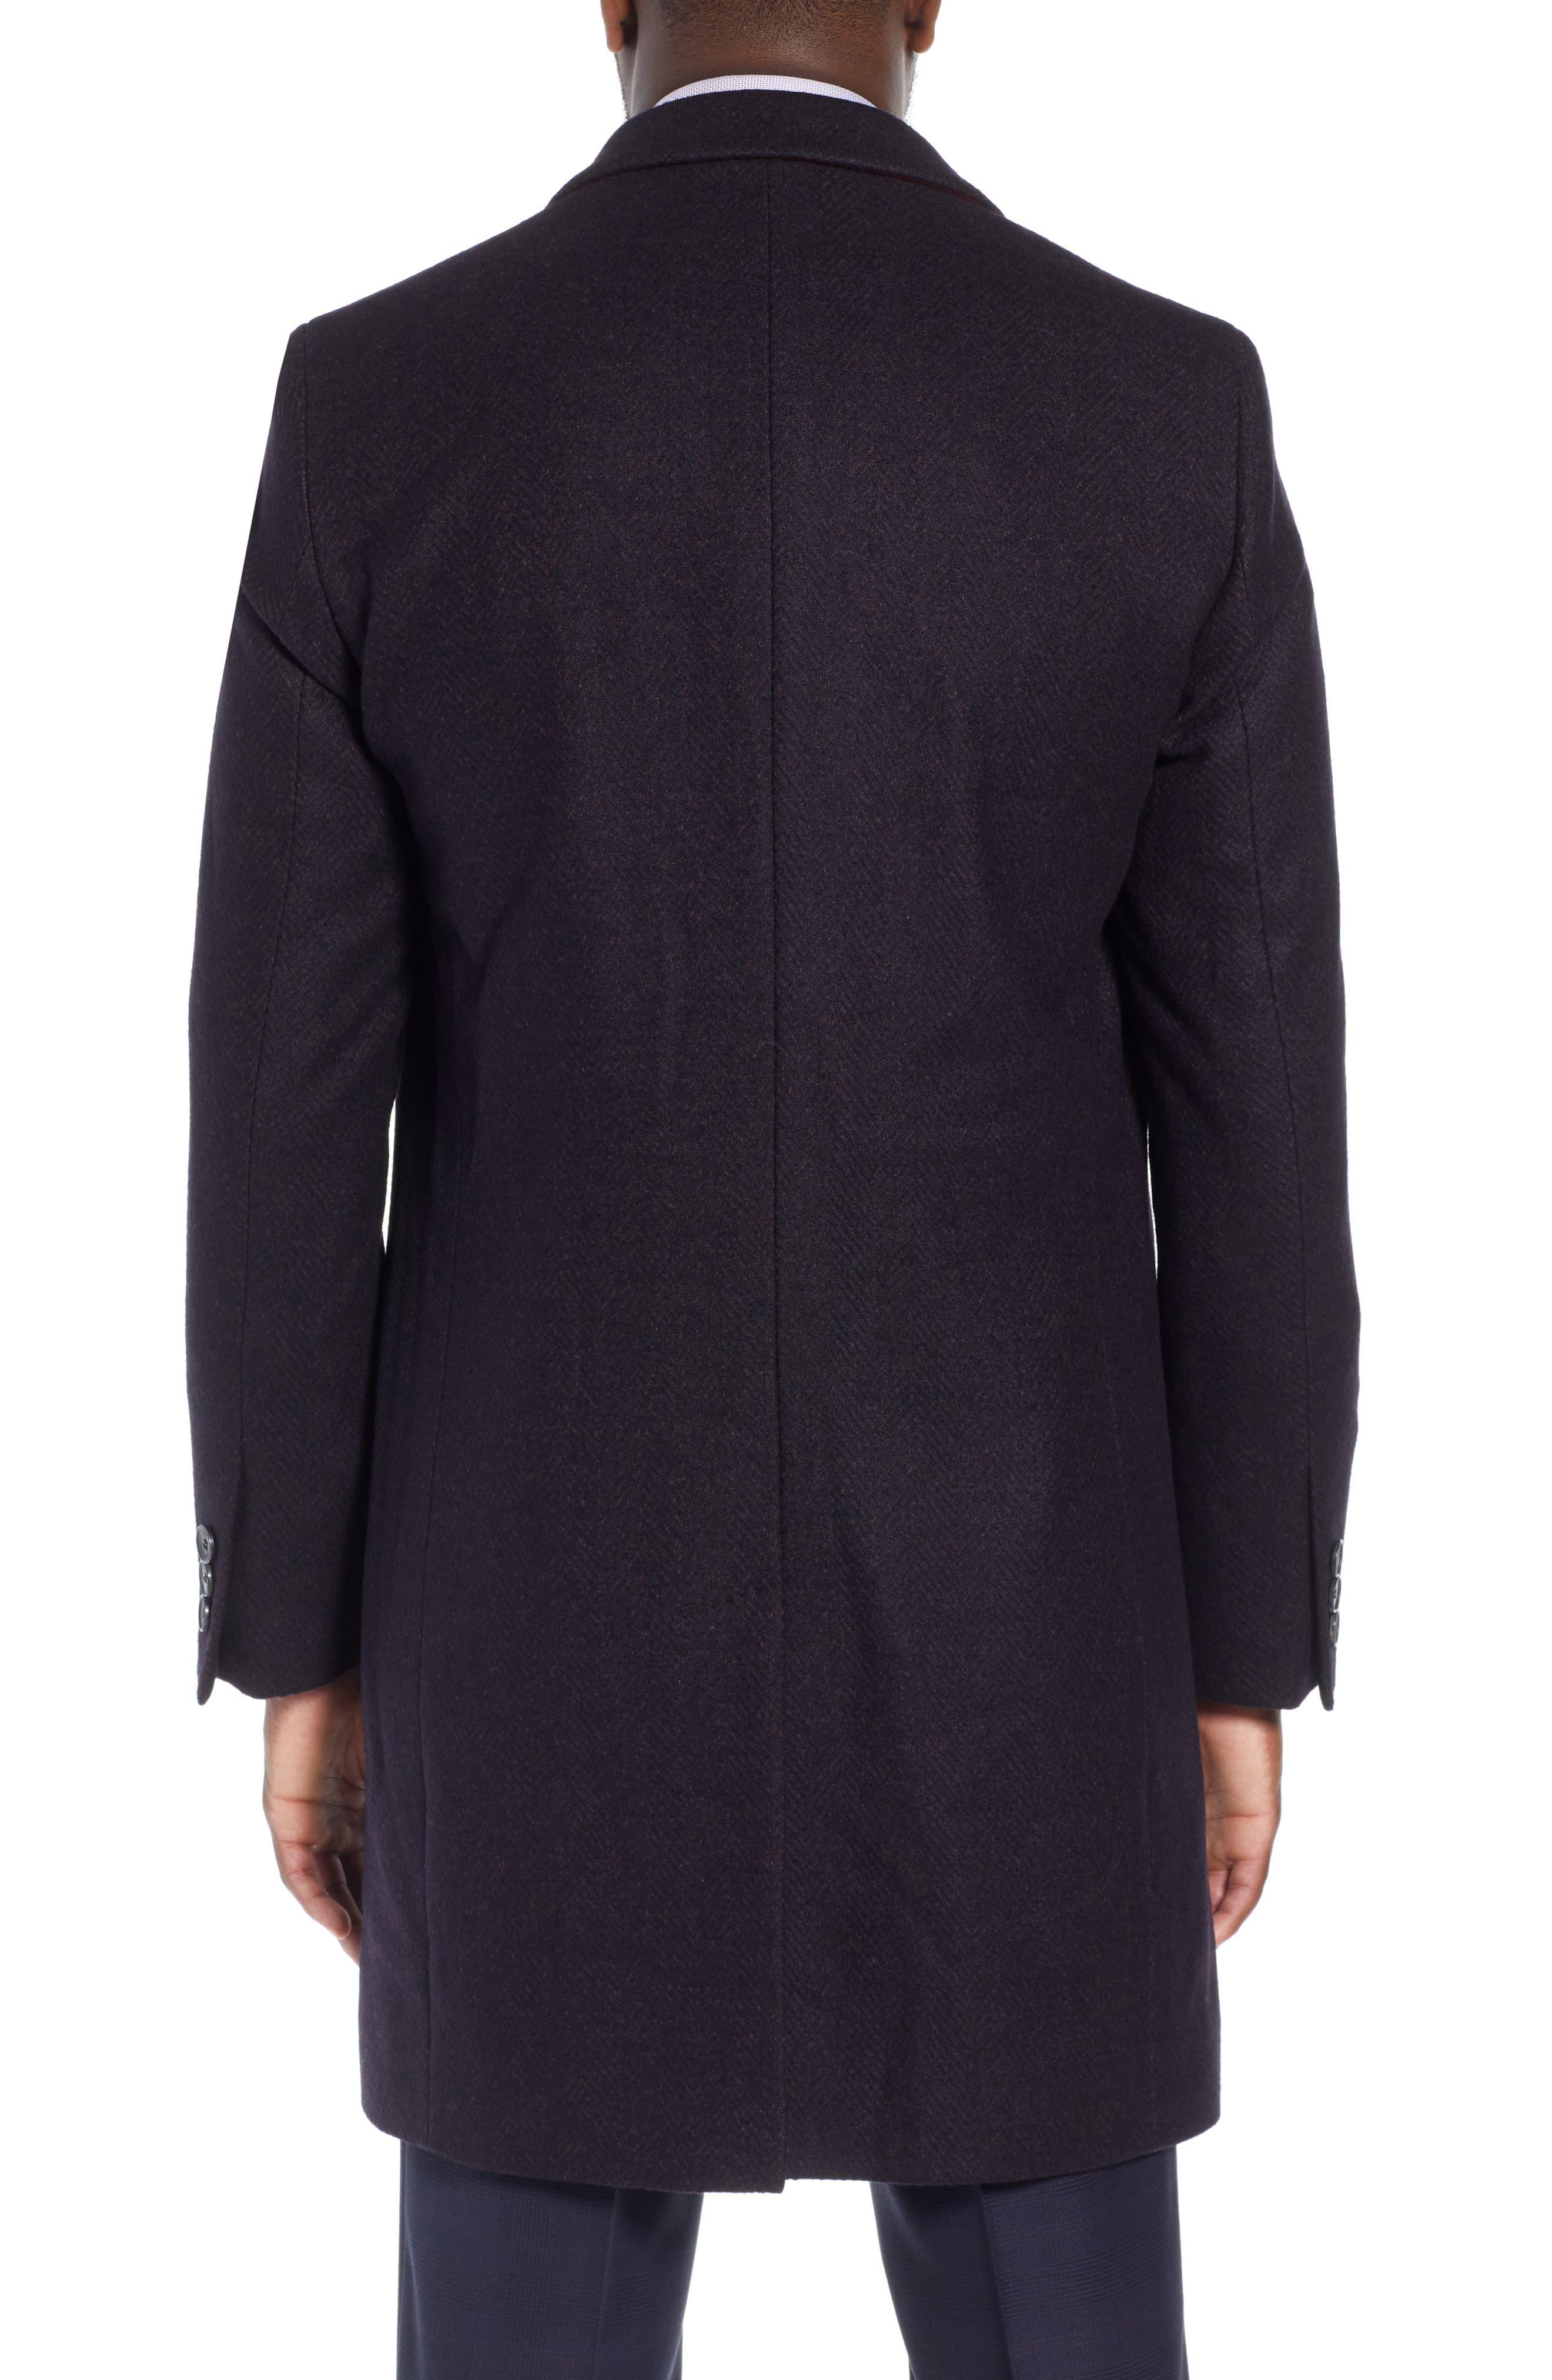 x Nordstrom Nye Wool Blend Top Coat,                             Alternate thumbnail 2, color,                             DARK RED